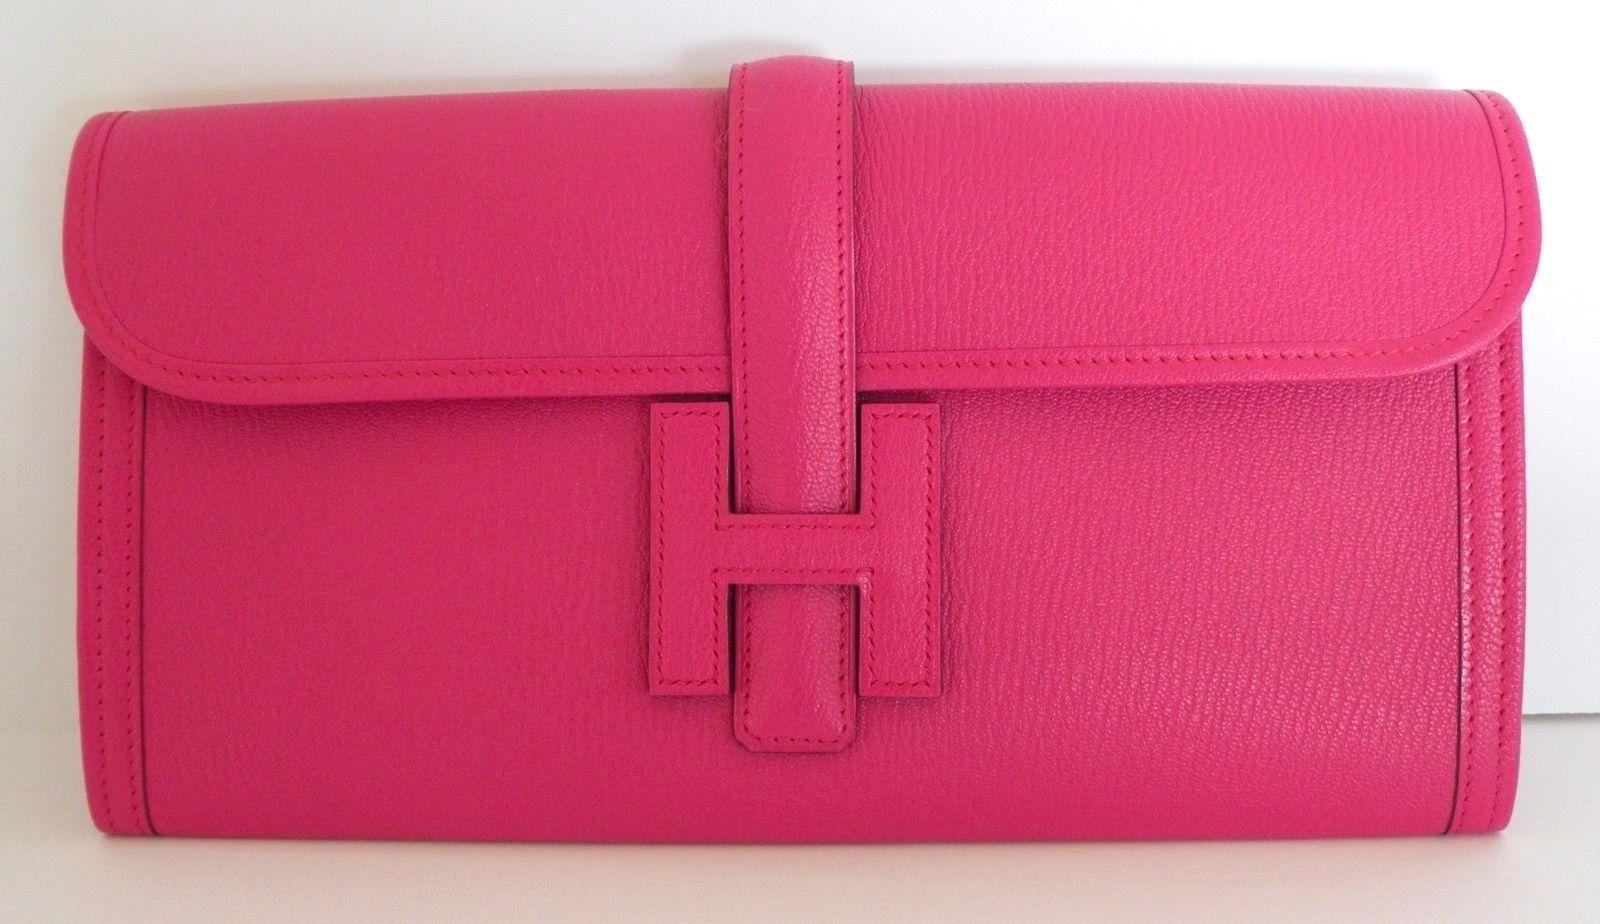 14c96804b Hermes Bag Jige Elan Clutch 29cm Rose and 50 similar items